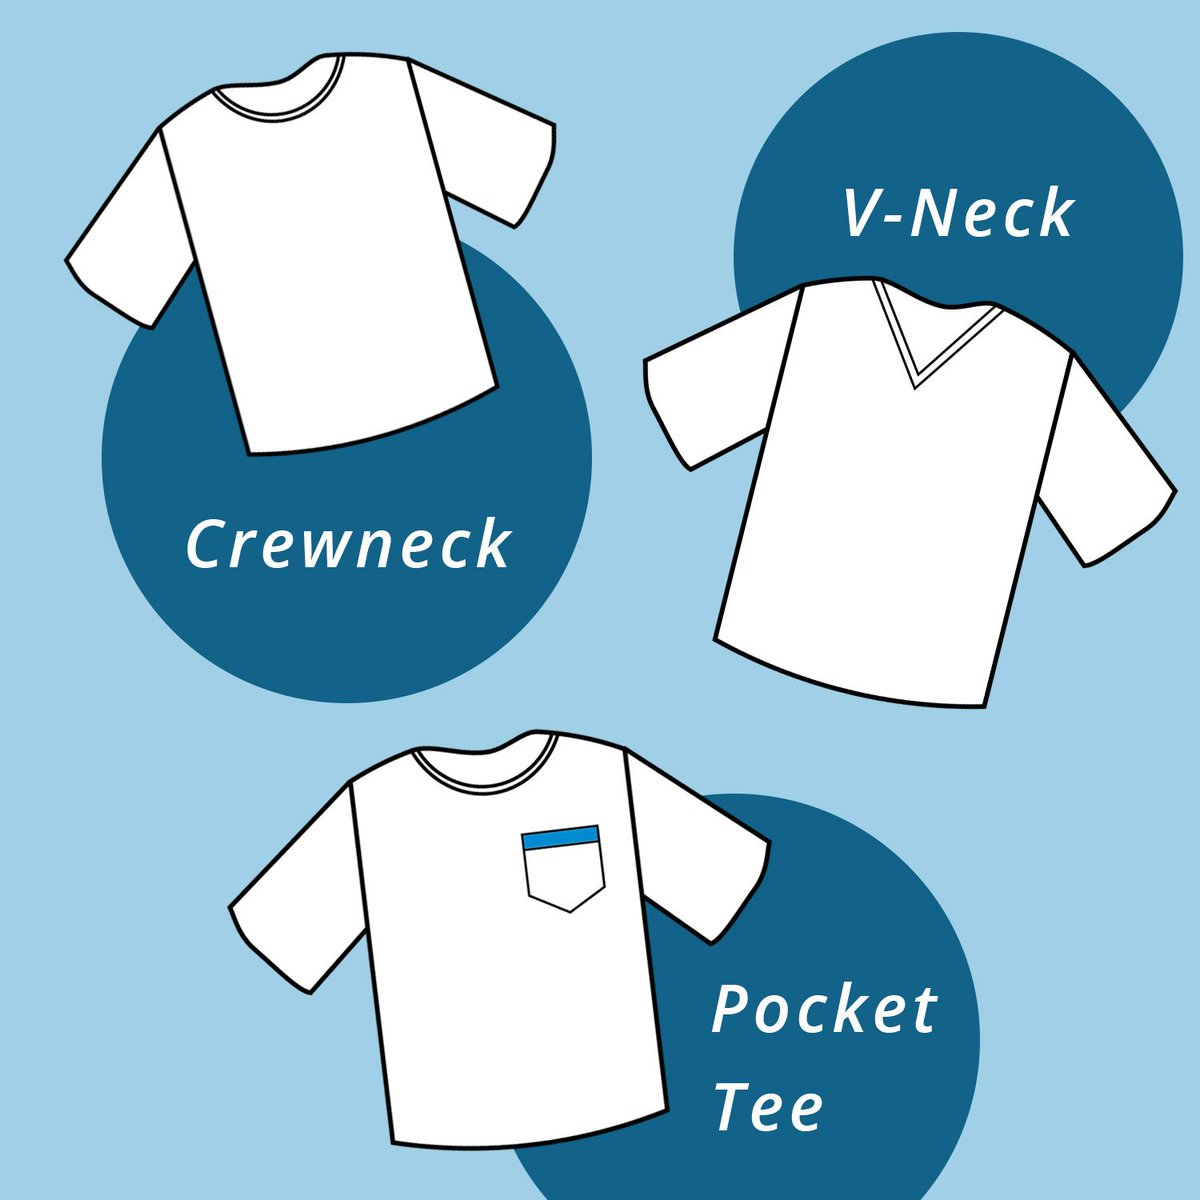 fa9a84465  tshirts  customtshirts  vneck  rugbyshirts   henleyshirtspic.twitter.com vfXm4tvfVf